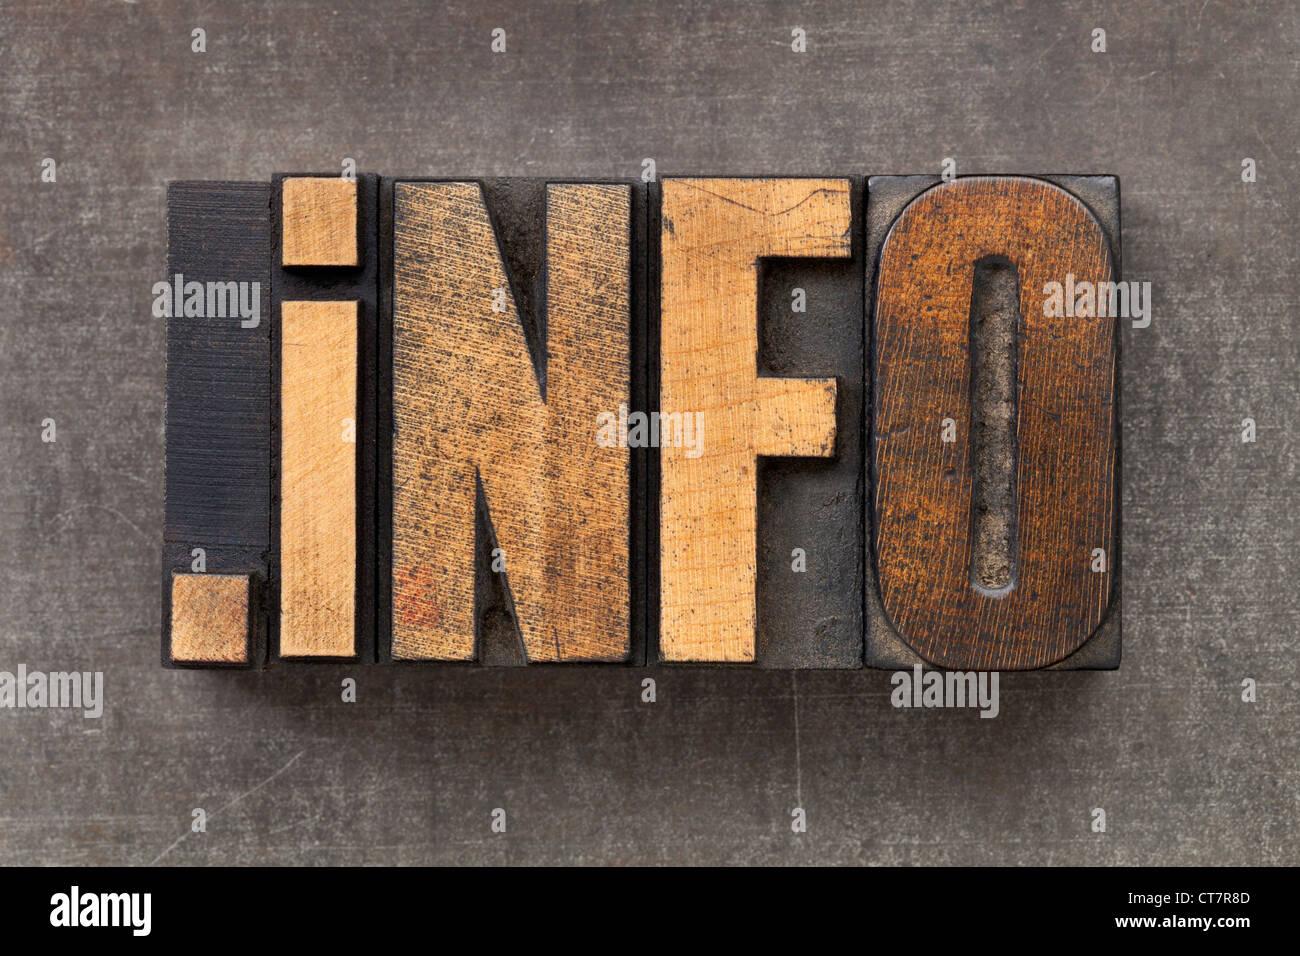 dot info - internet domain for information resources in vintage wooden letterpress printing blocks on a grunge metal - Stock Image